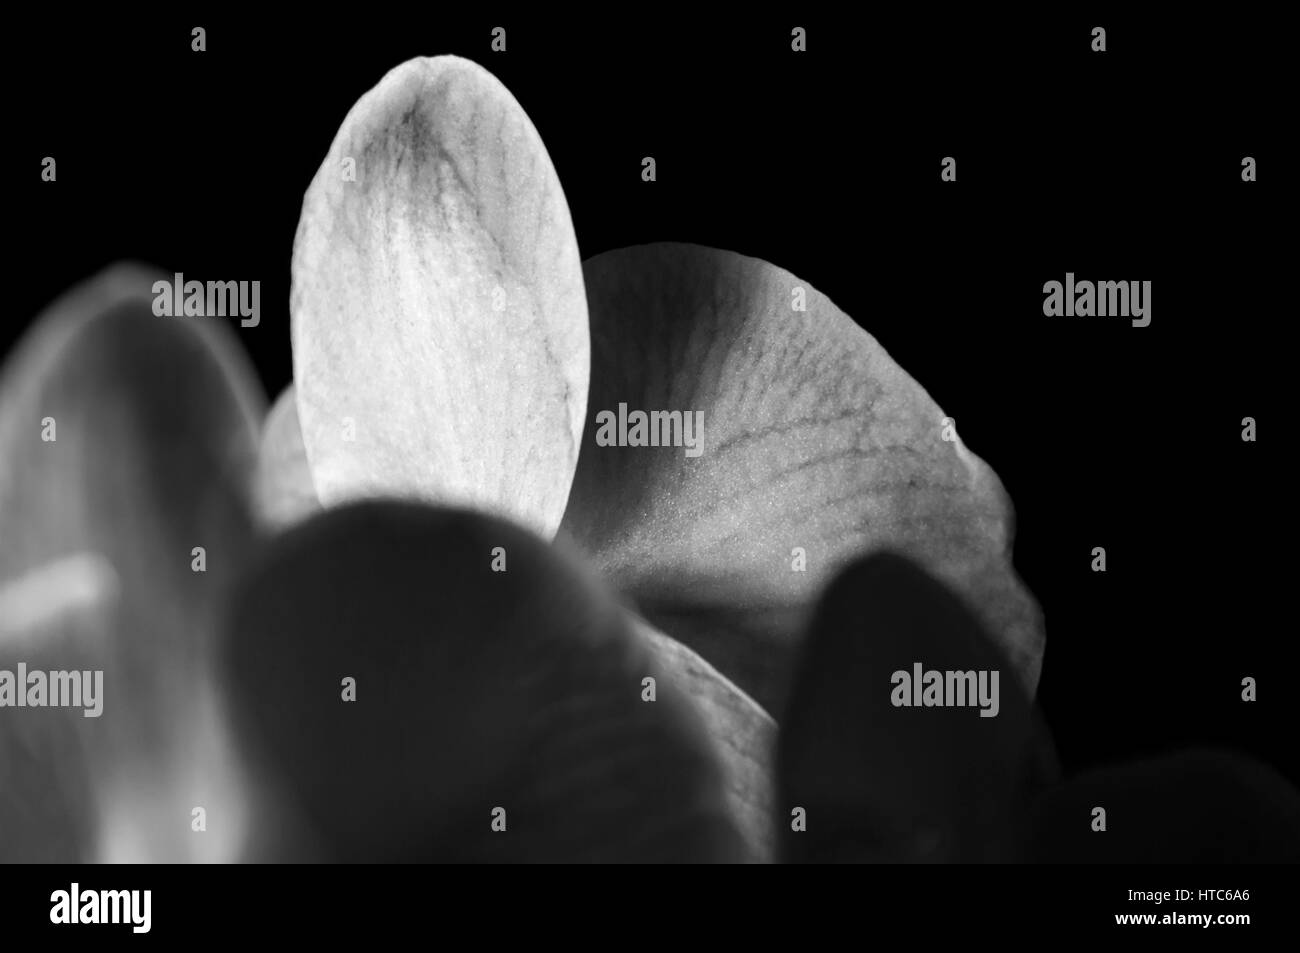 flowers purity - Stock Image